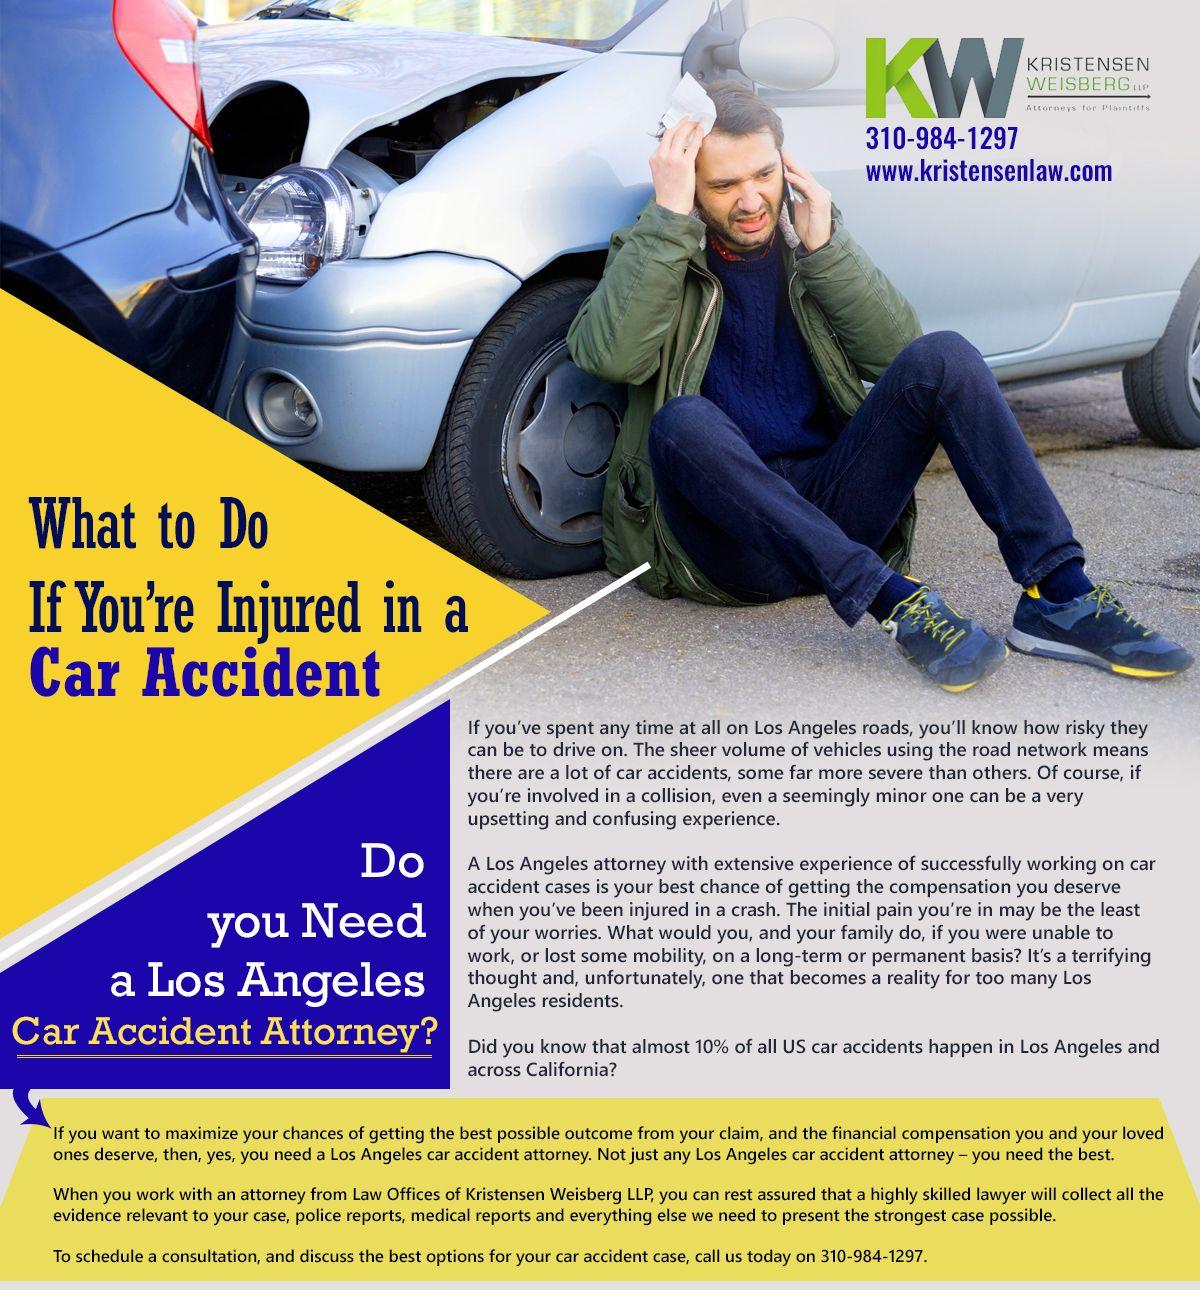 Car accident attorney car accident accident attorney